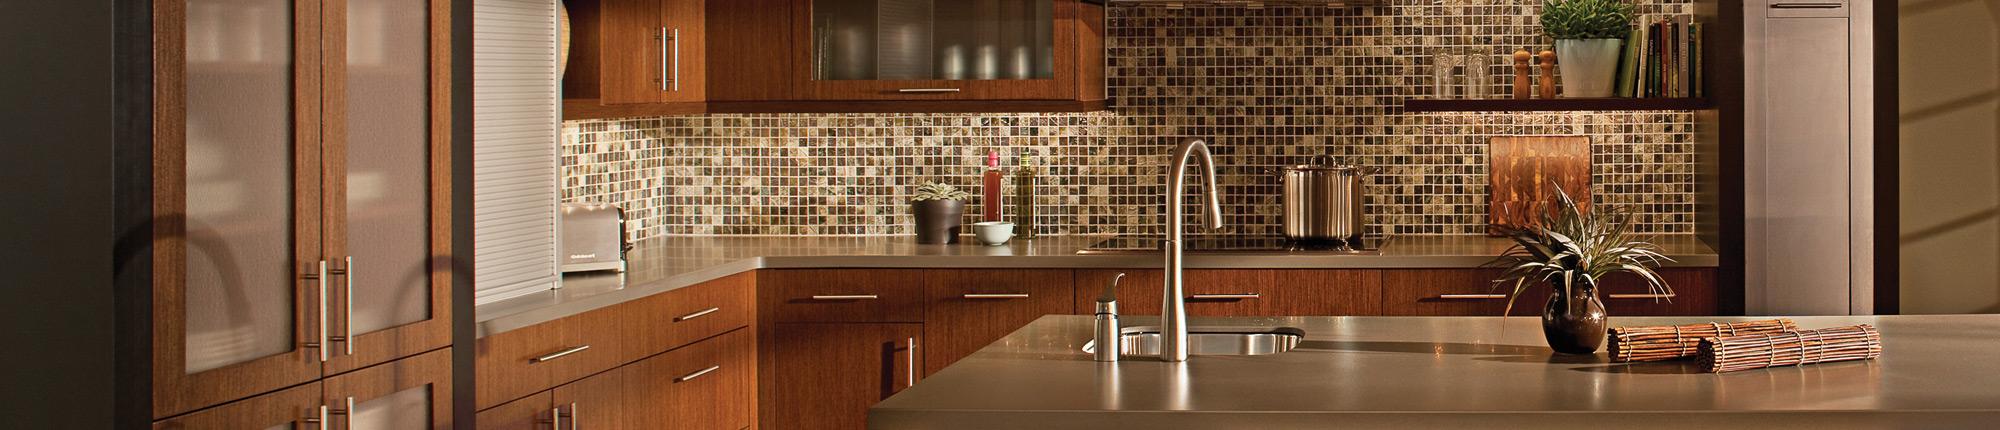 Custom Bathroom U0026 Kitchen Designs In Utica NY   Fahyu0027s Of Central NY